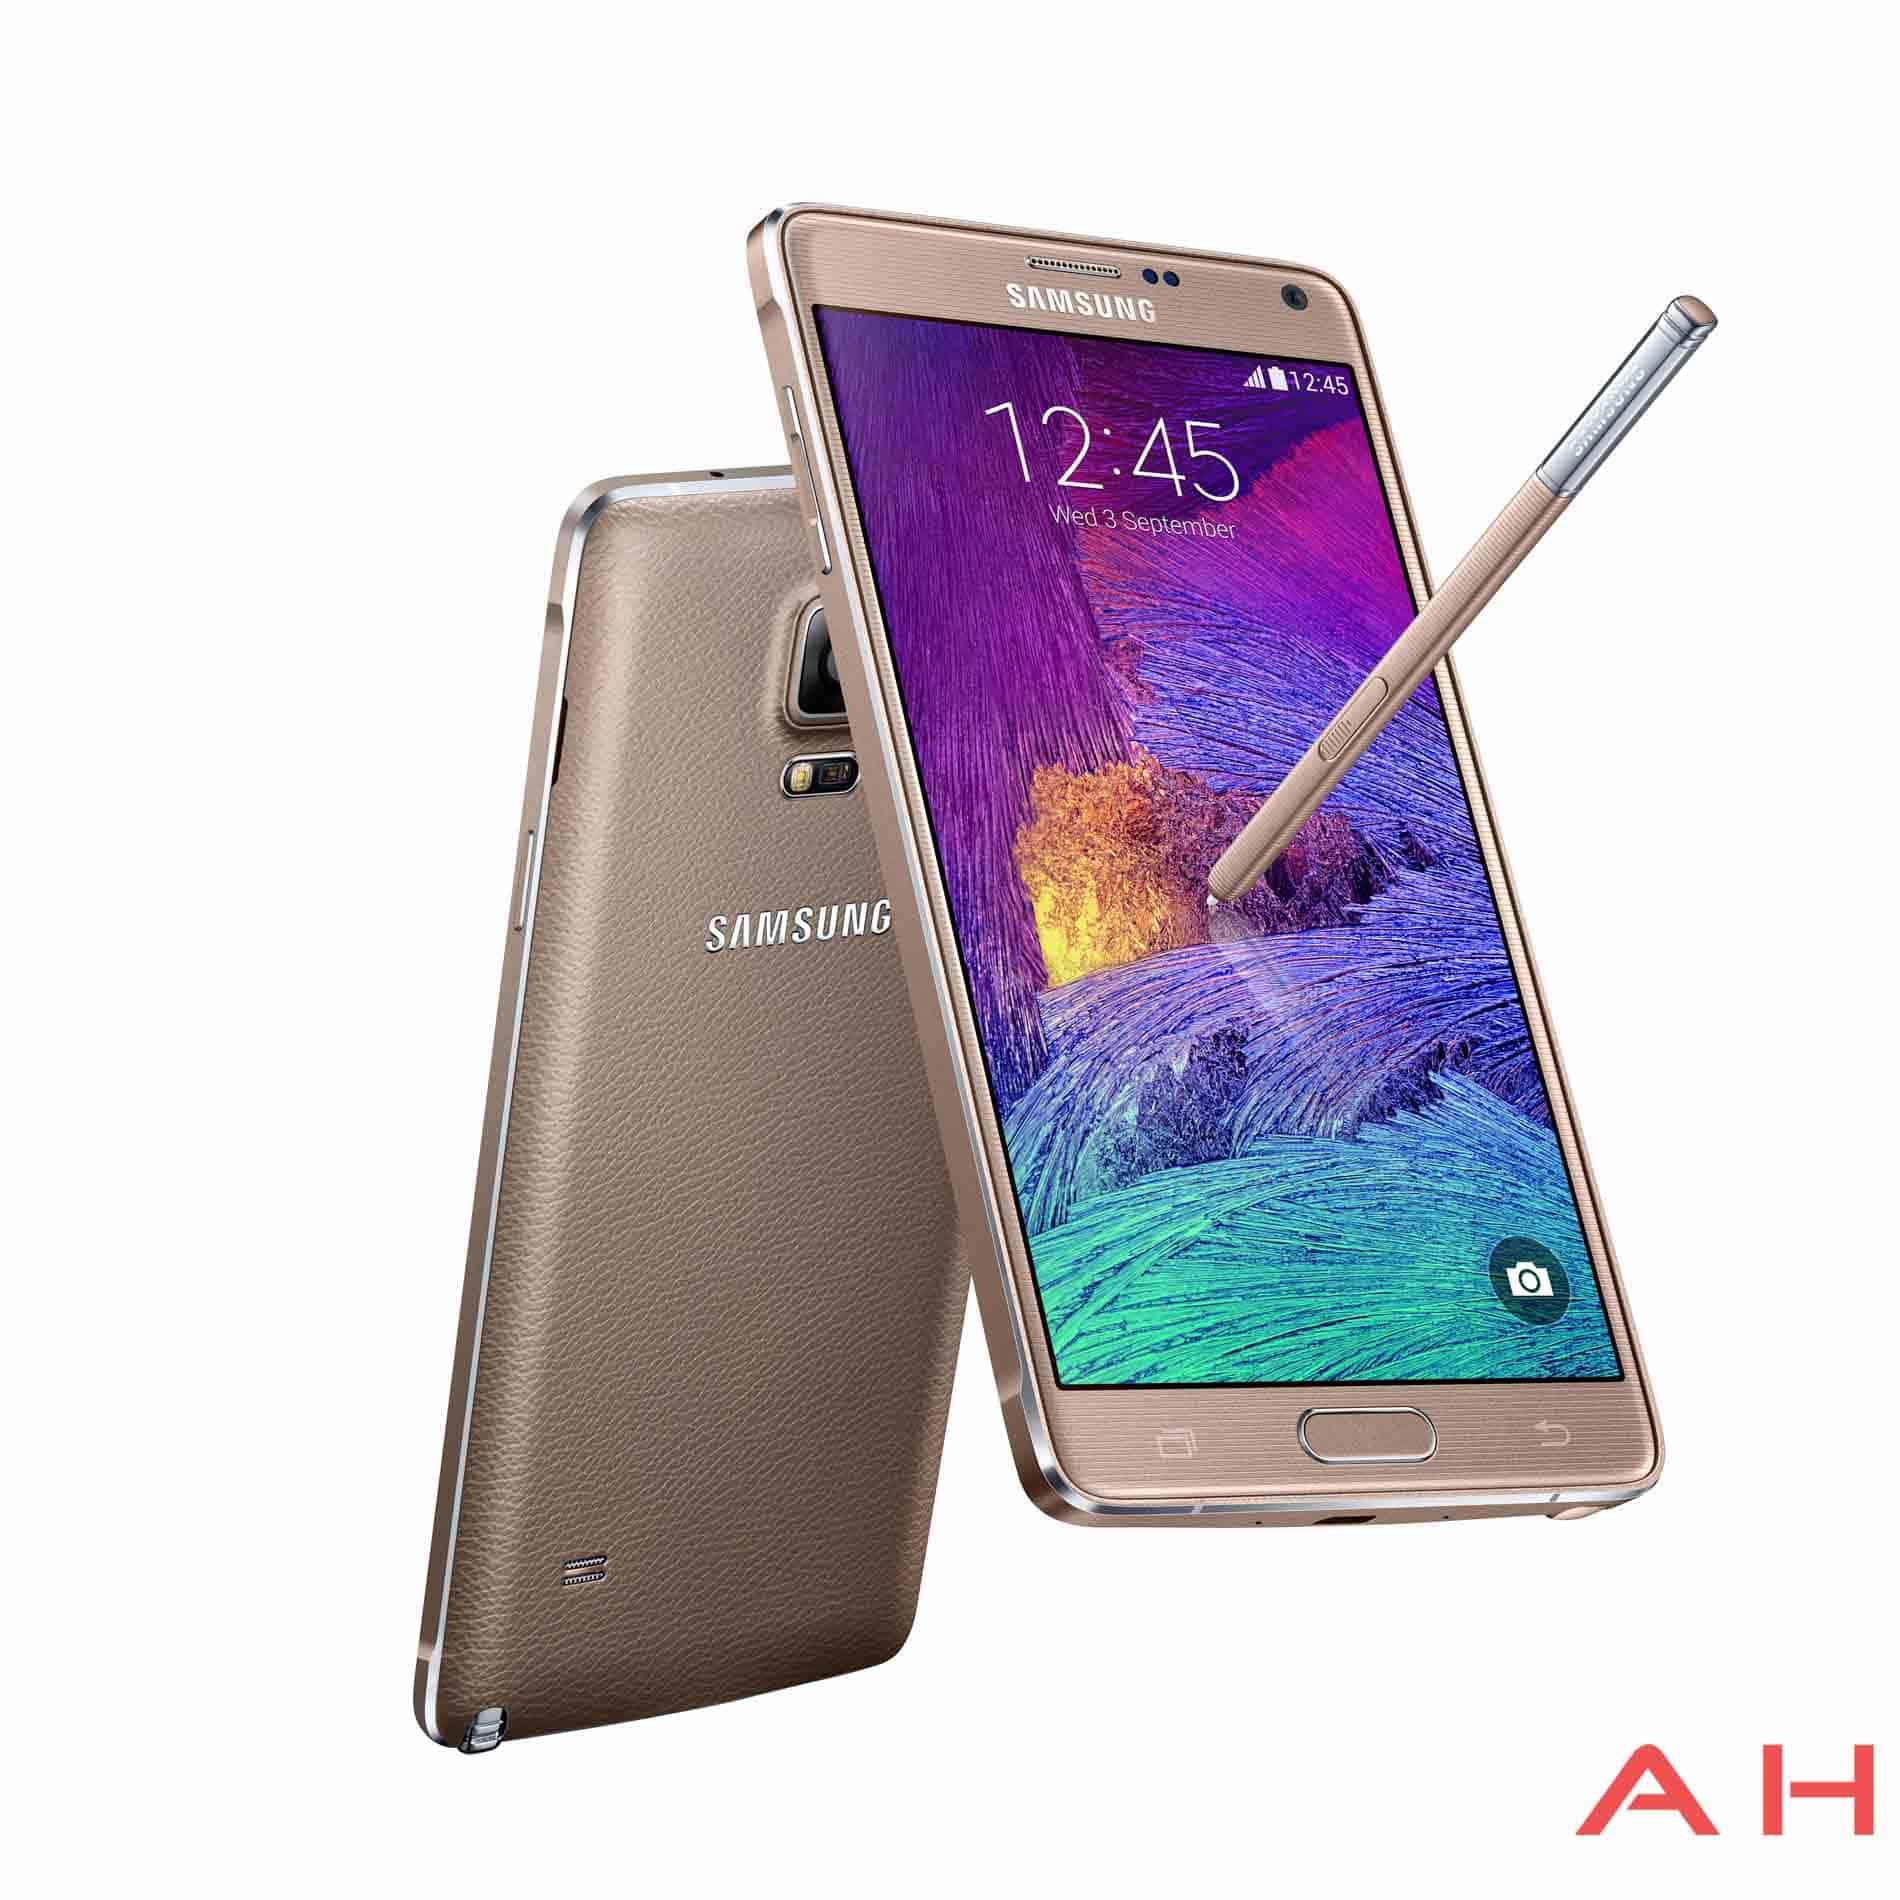 Samsung Galaxy Note 4 AH 3